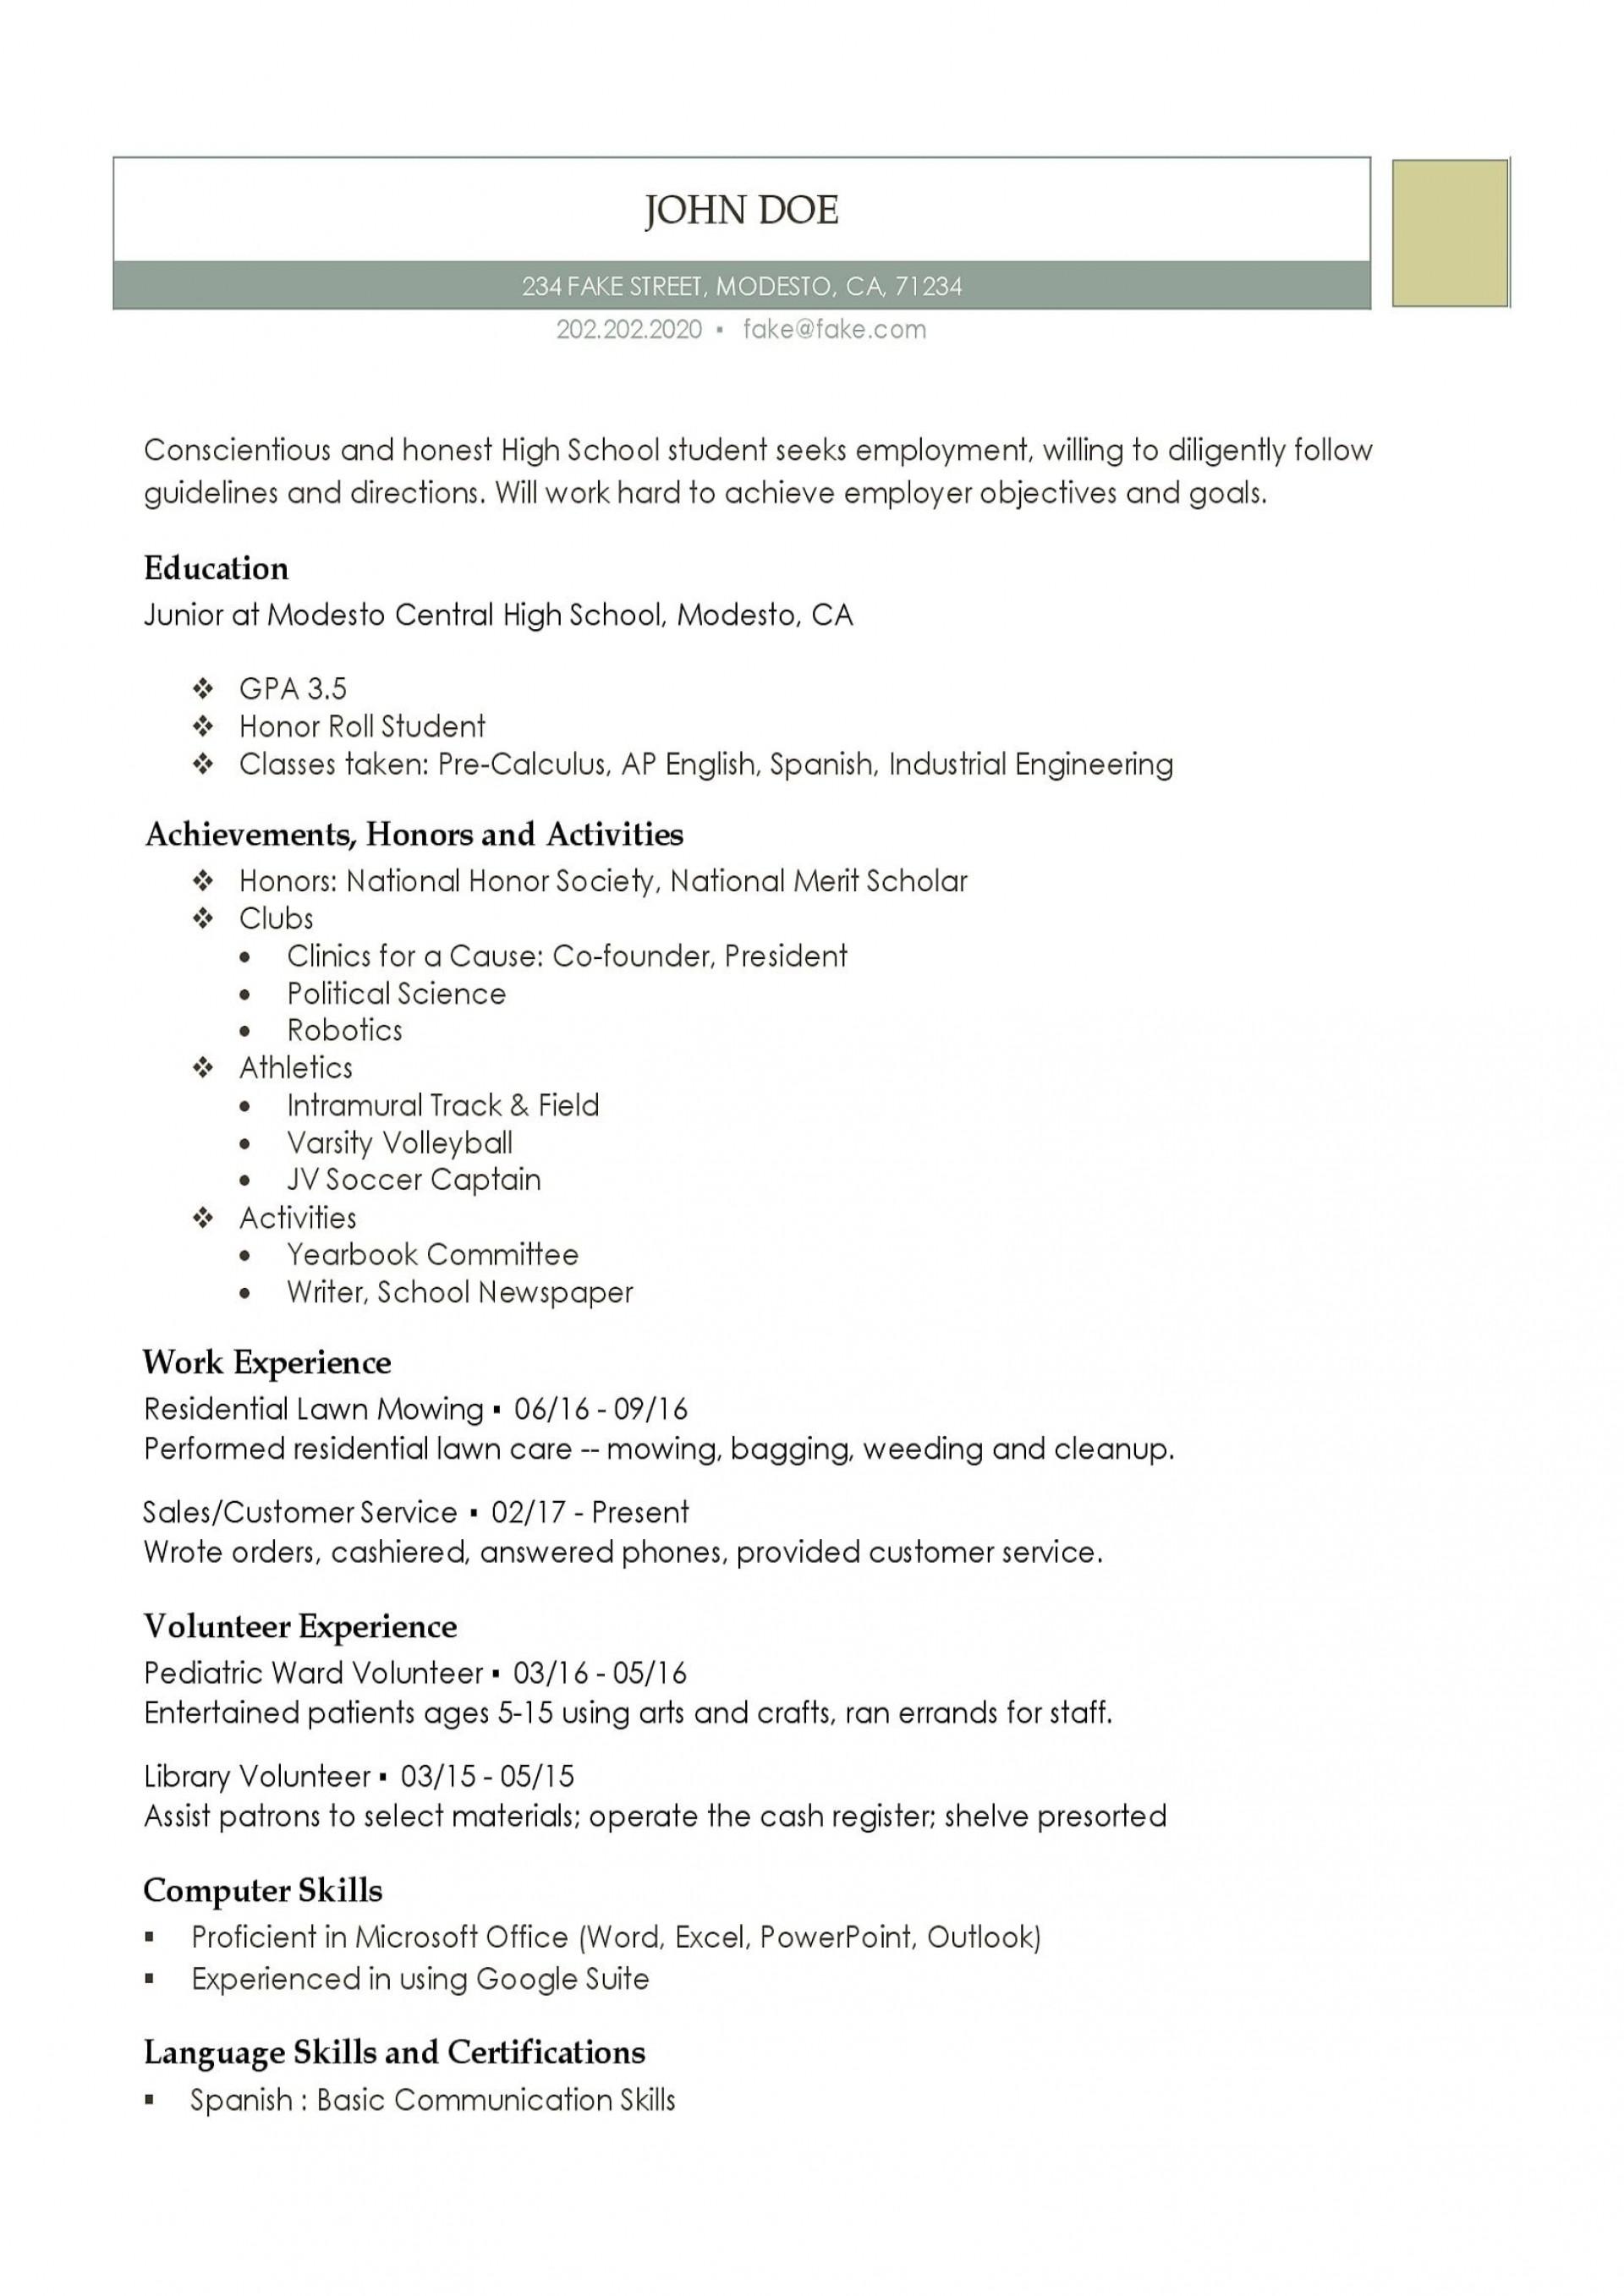 003 Unforgettable Free High School Resume Template Microsoft Word Inspiration 1920